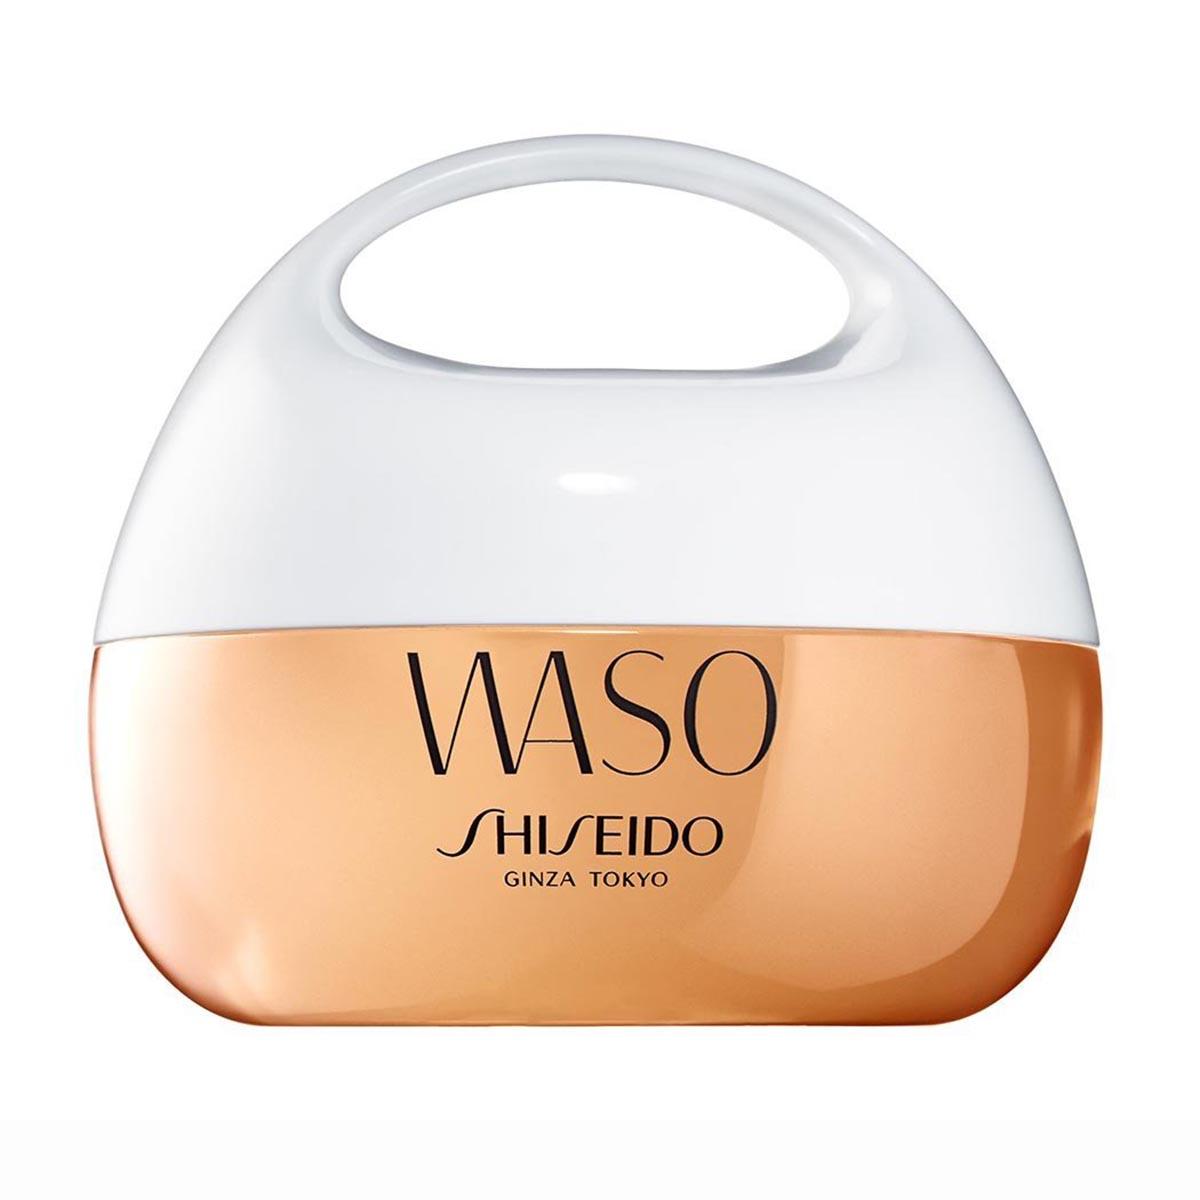 Shiseido waso megahydratant crema 50ml